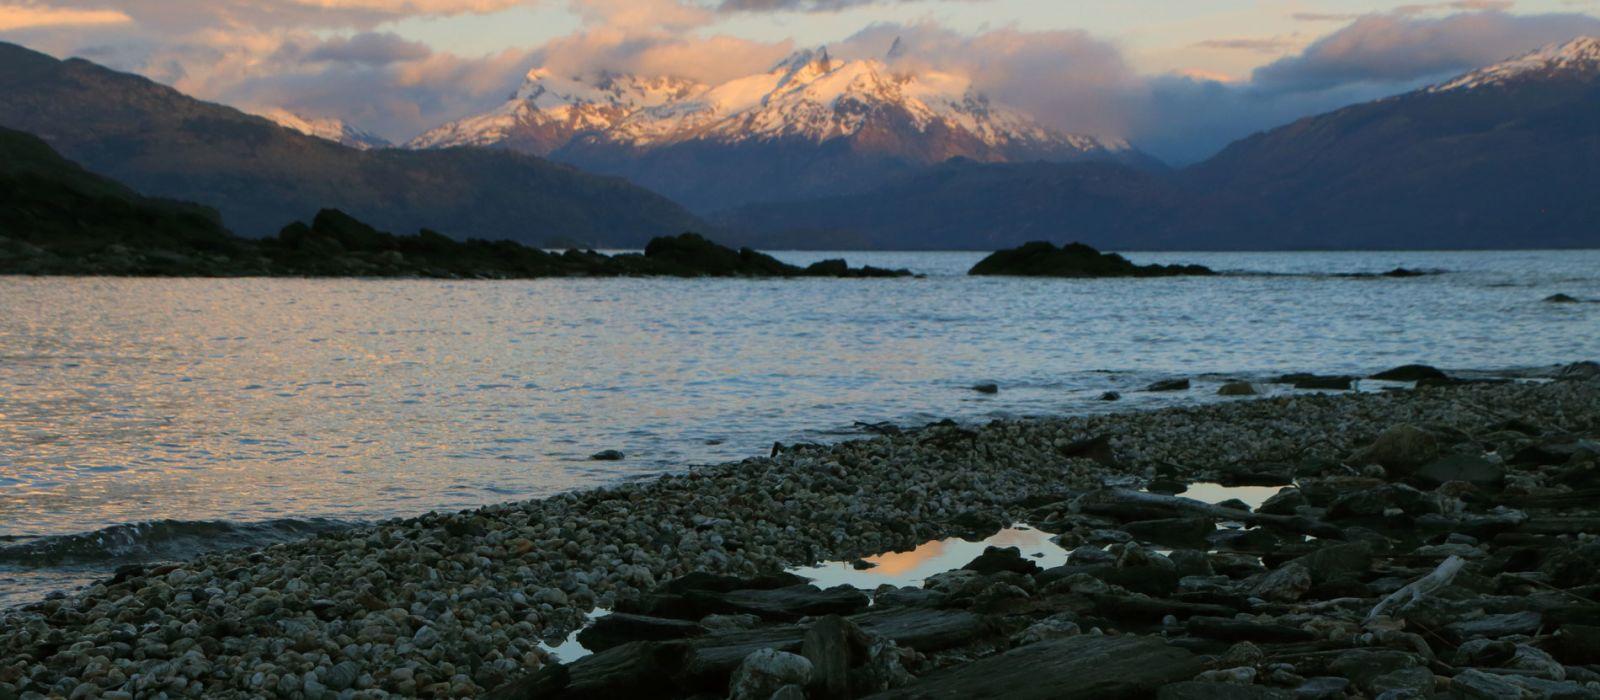 Destination Puerto Guadal Chile